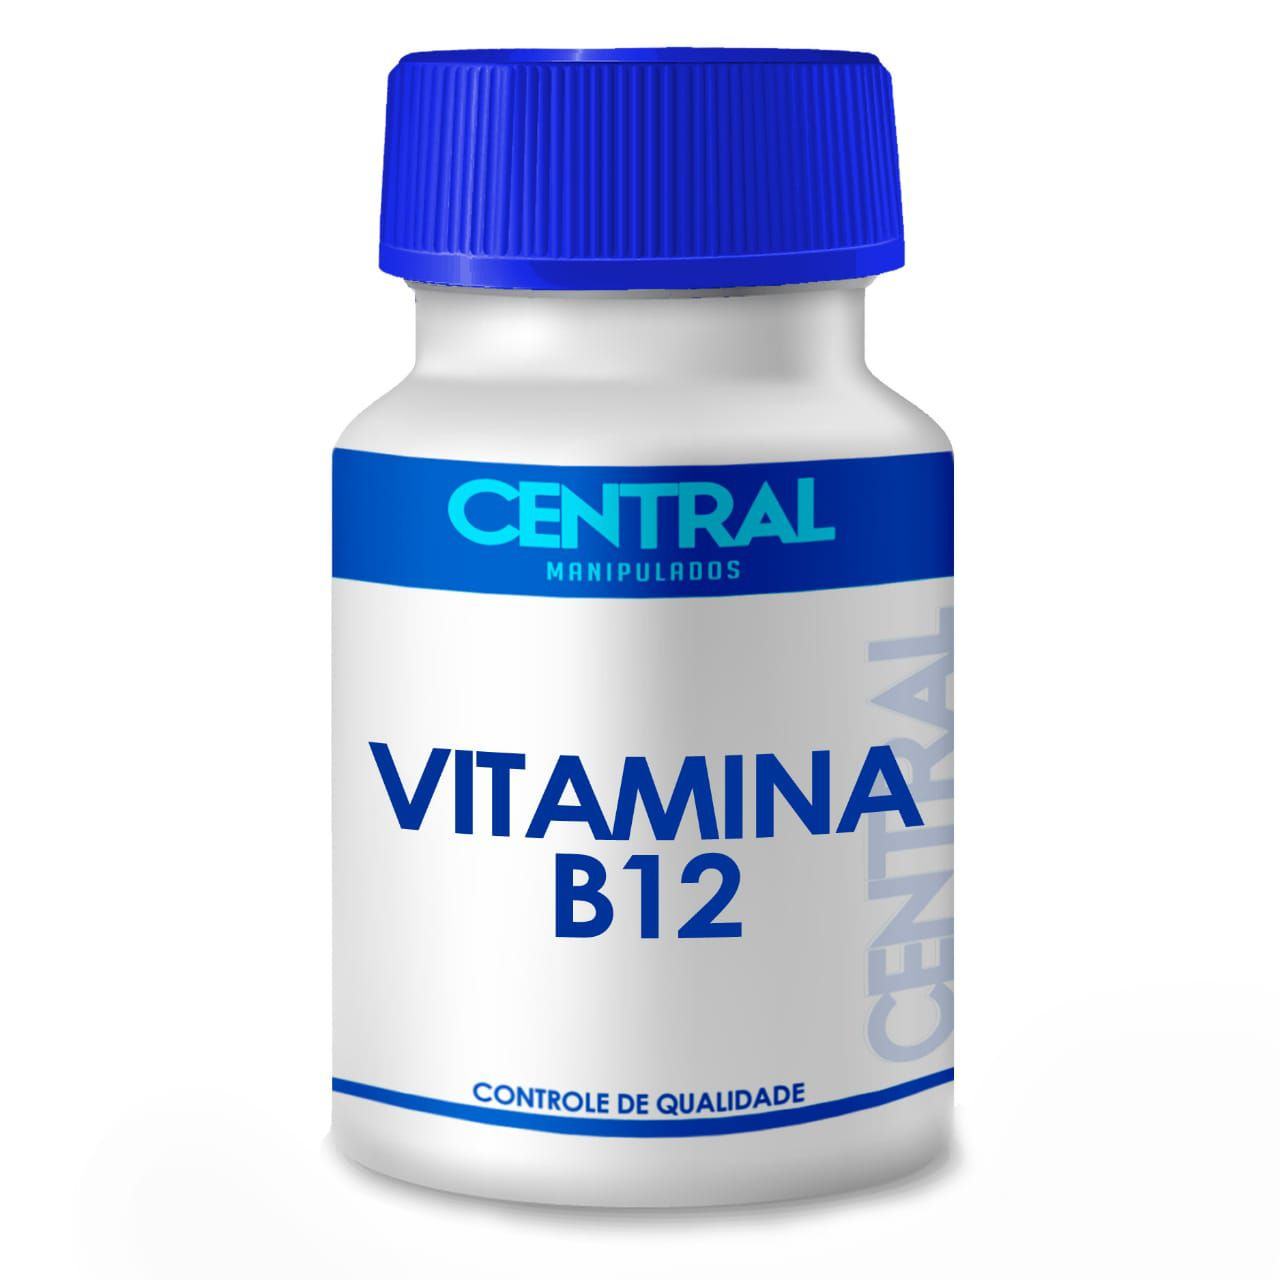 Vitamina B12 1mg 60 Comprimidos Sublingual - Tratamento de anemia e fortalece o  sistema imunológico